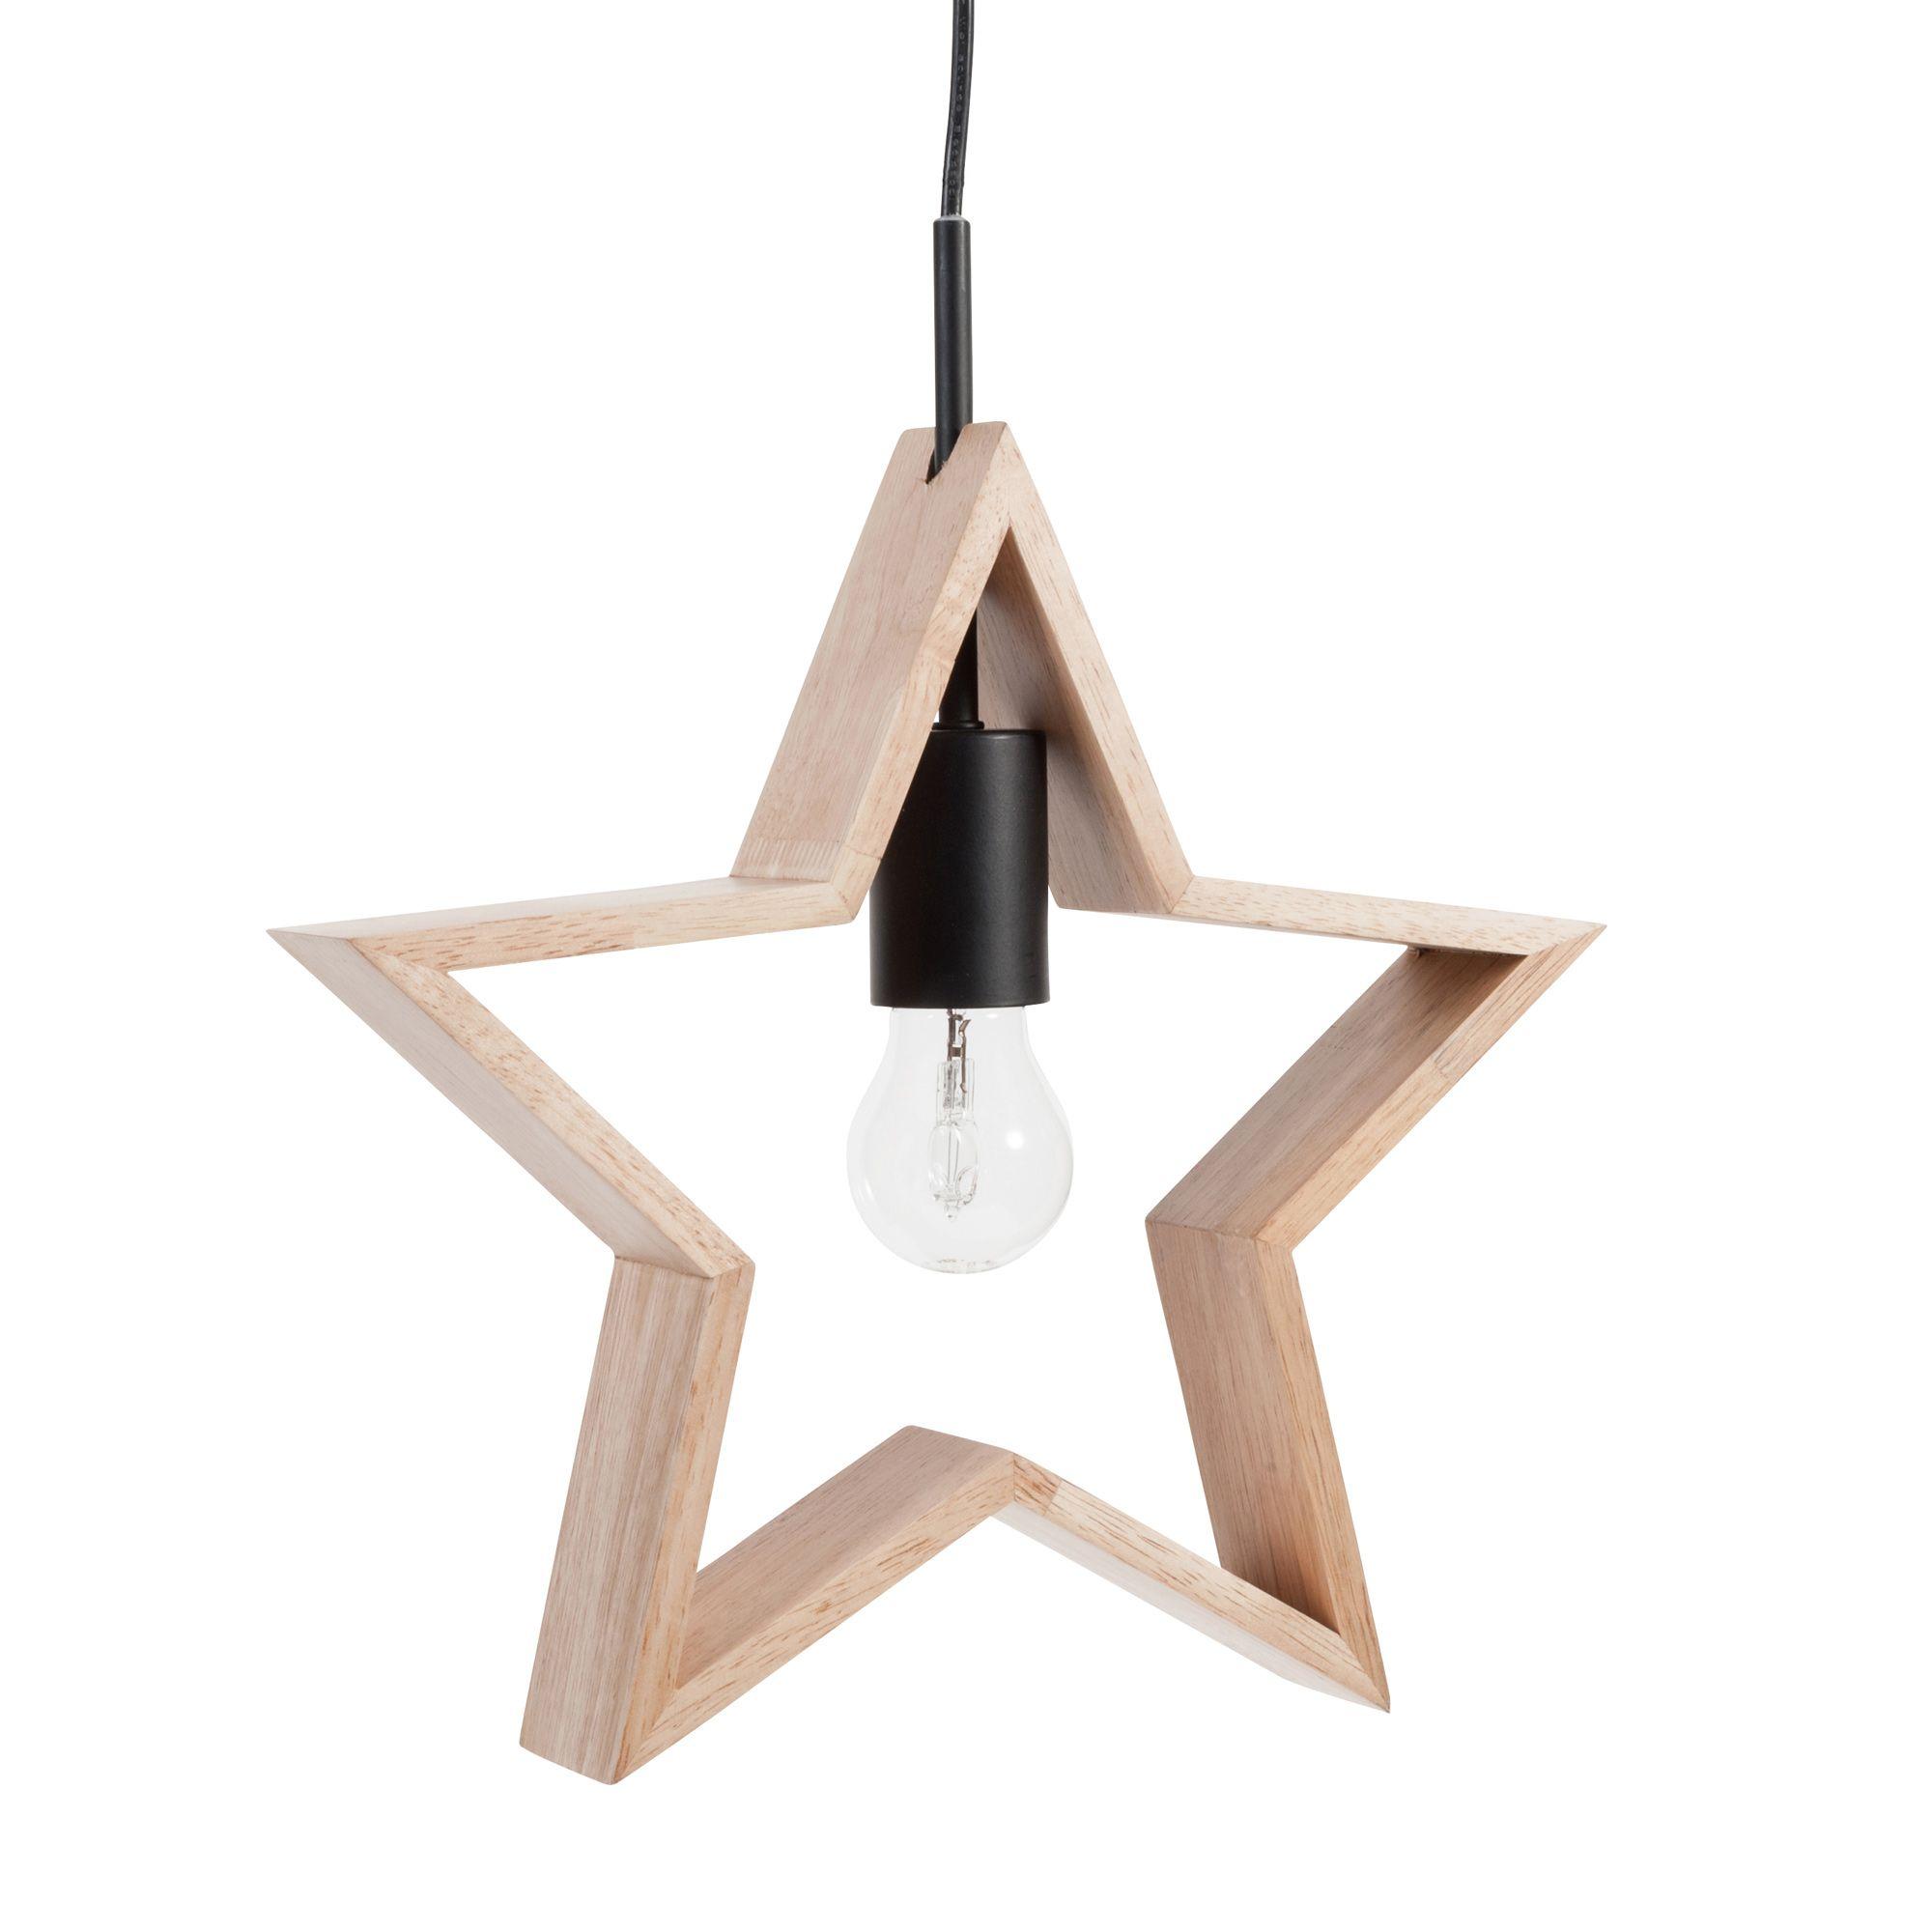 4be8b77d42cc289a353999754c232e0b Schöne Lampe Mit Mehreren Lampenschirmen Dekorationen